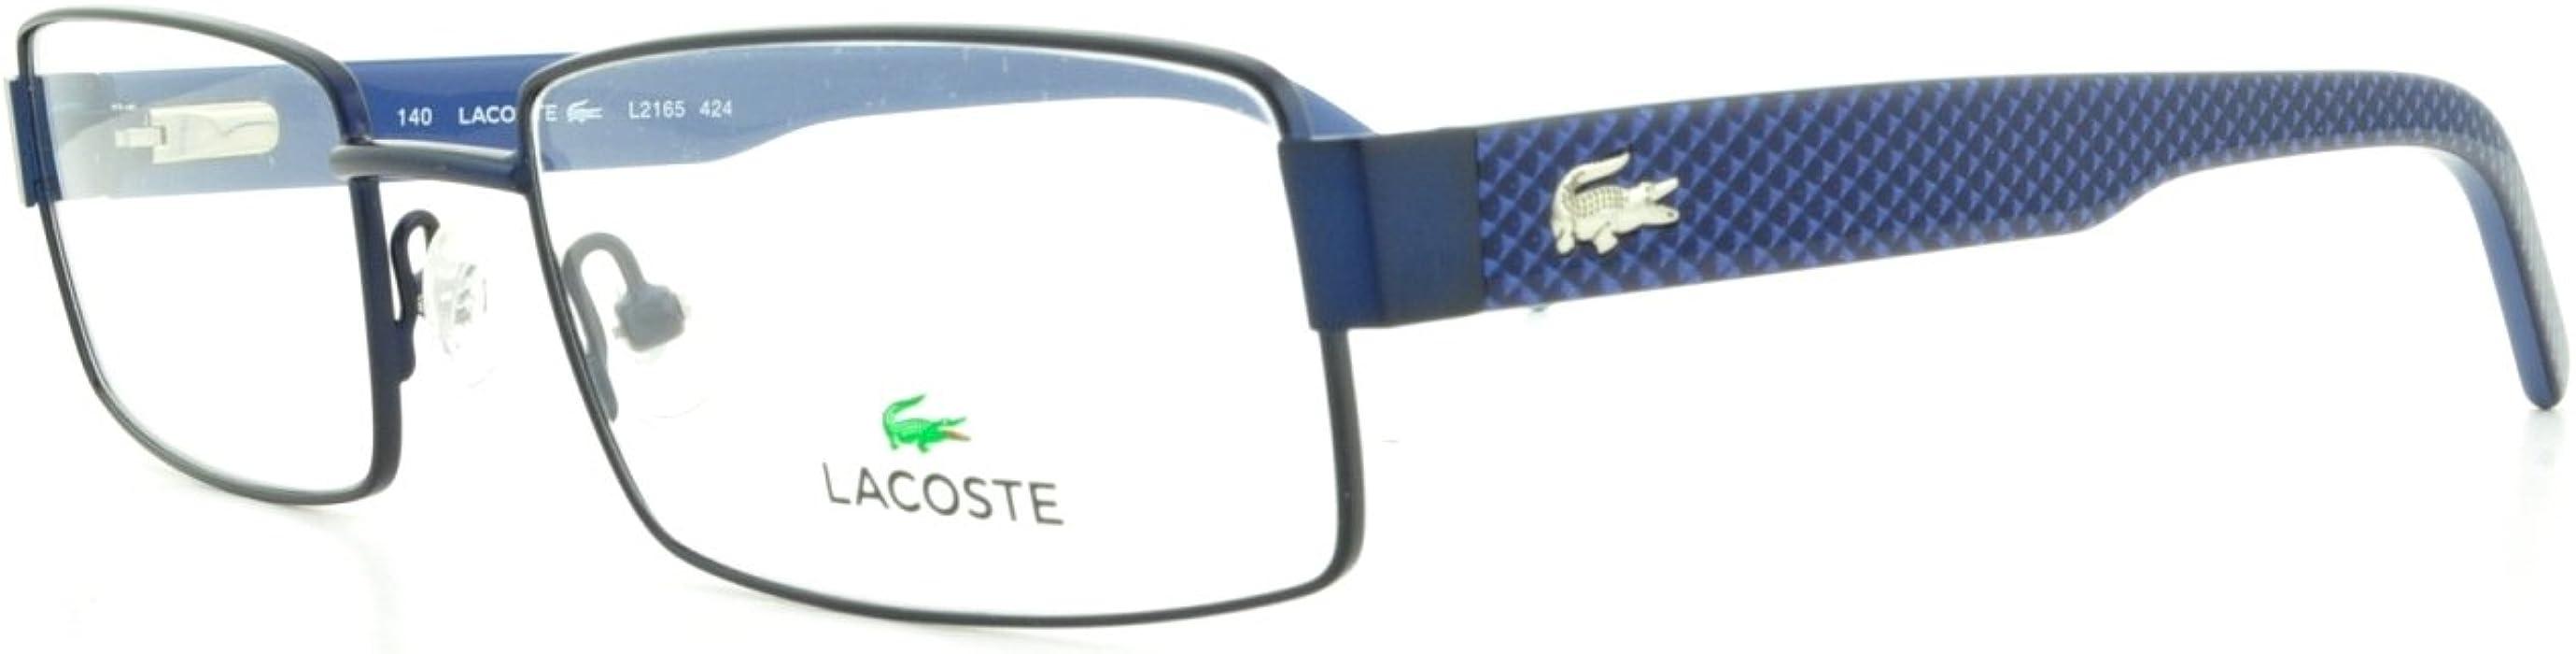 627bb1beb37 LACOSTE Eyeglasses L2165 424 Blue 54MM at Amazon Men s Clothing ...